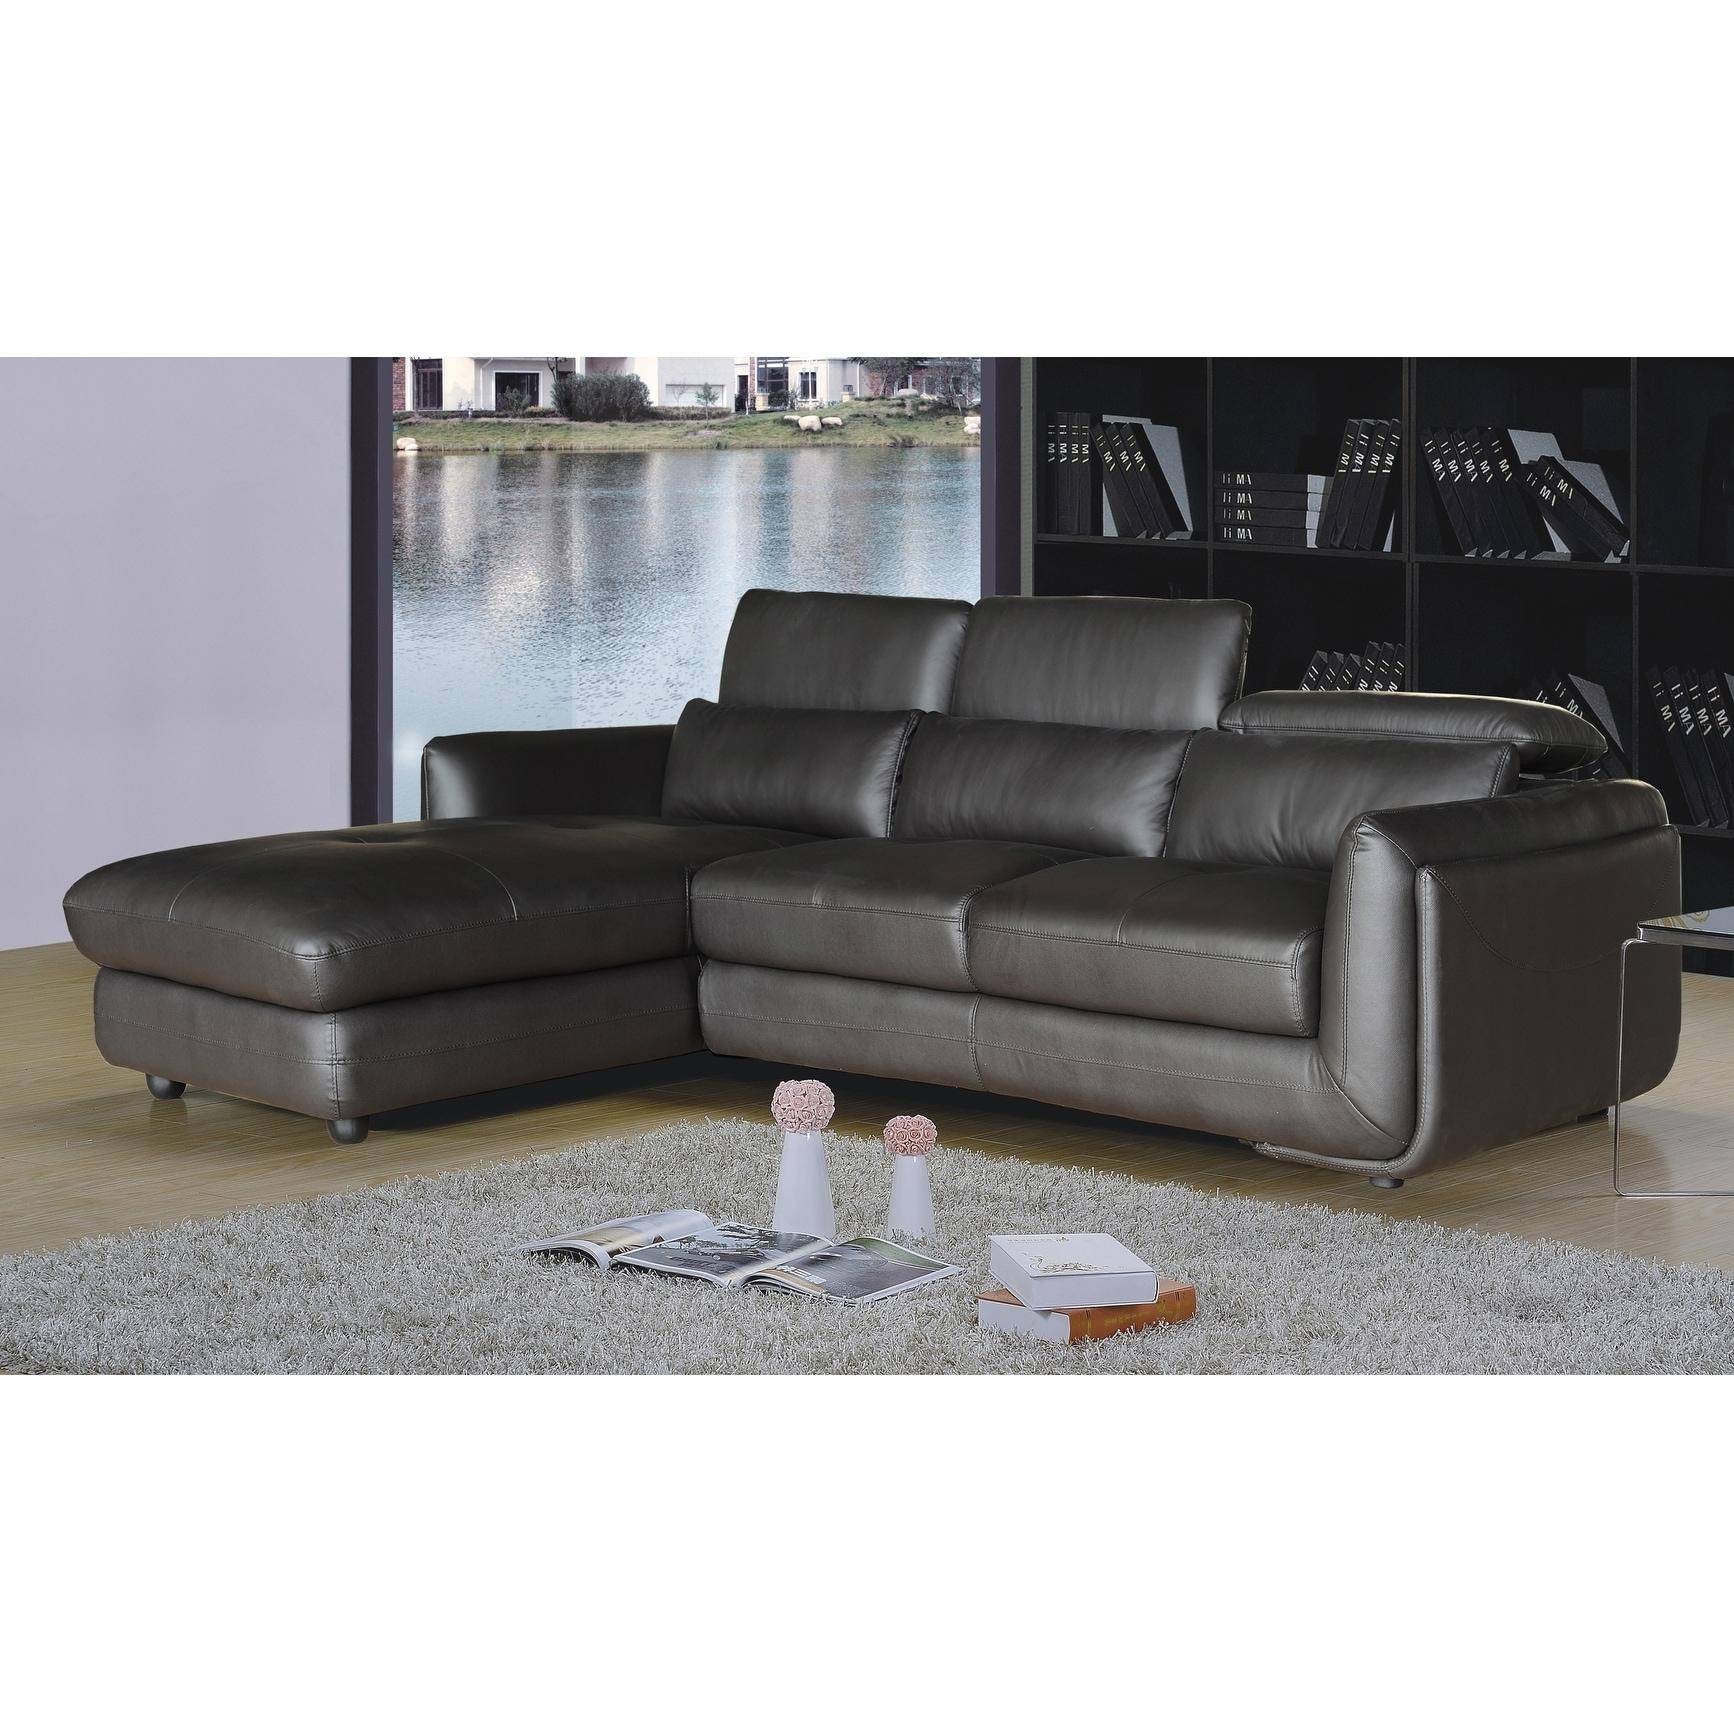 Ron Modern Brown Leather 2 Piece Sofa